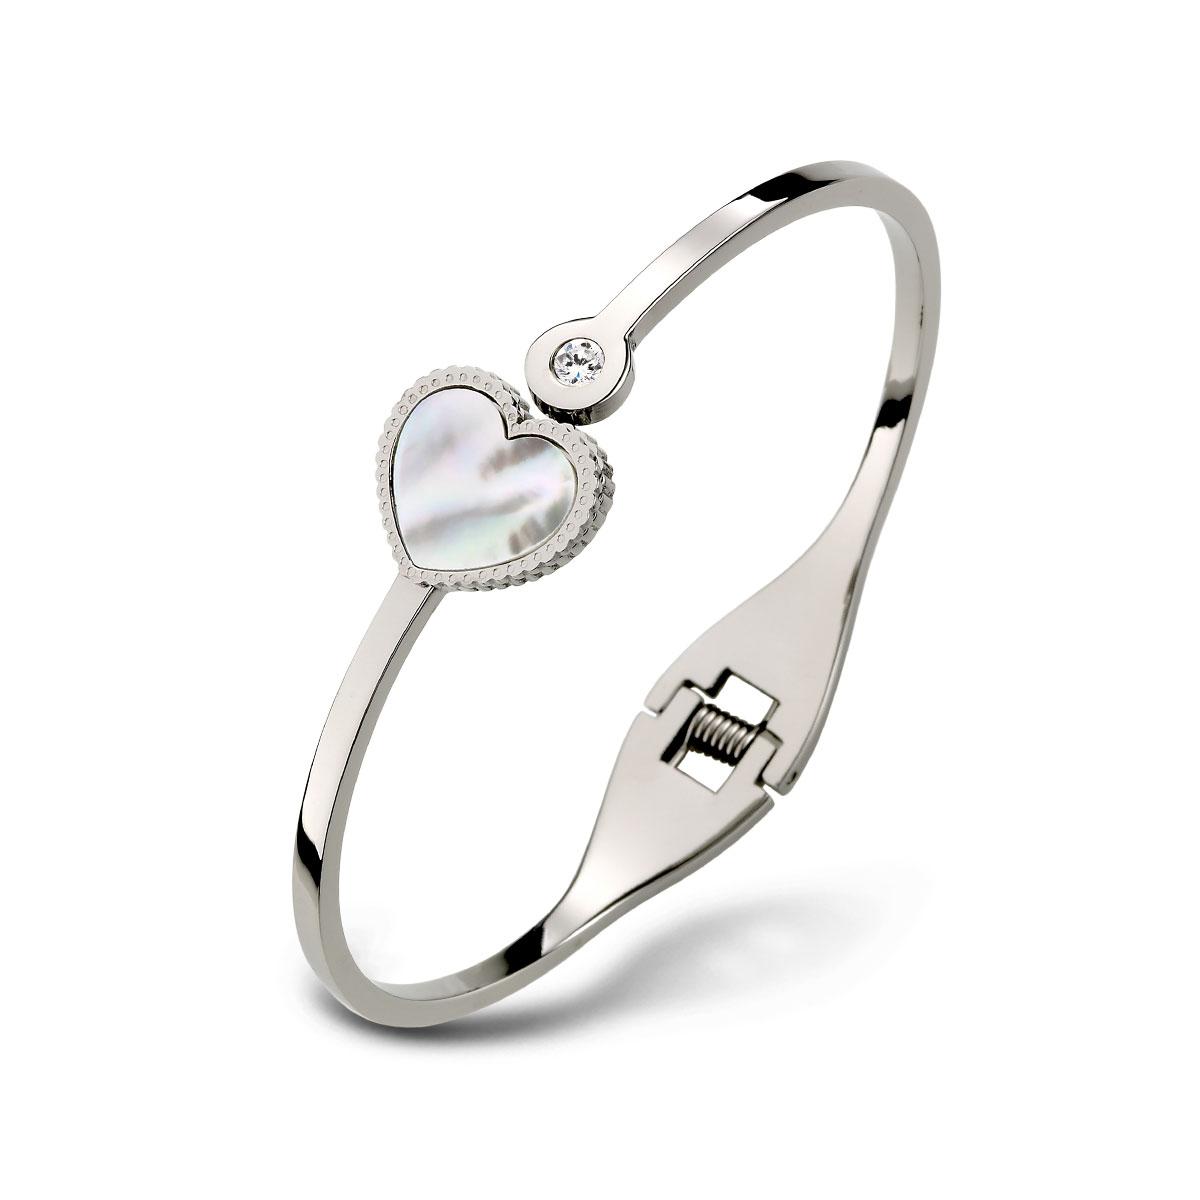 C86 愛在紐約夢幻愛心彩貝手環